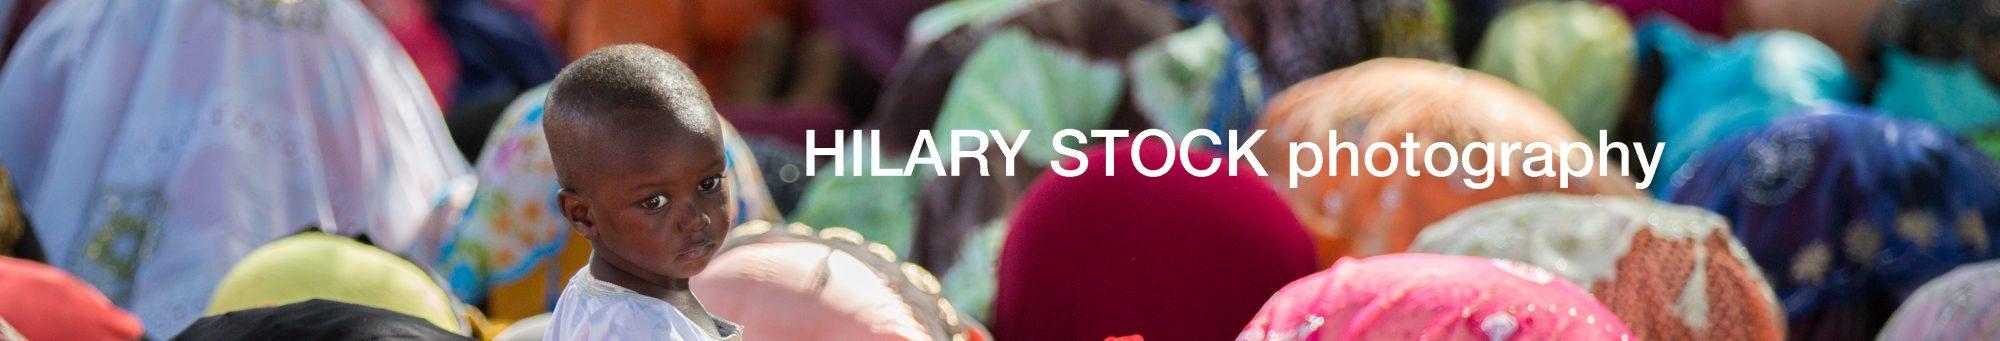 HILARY STOCK photography